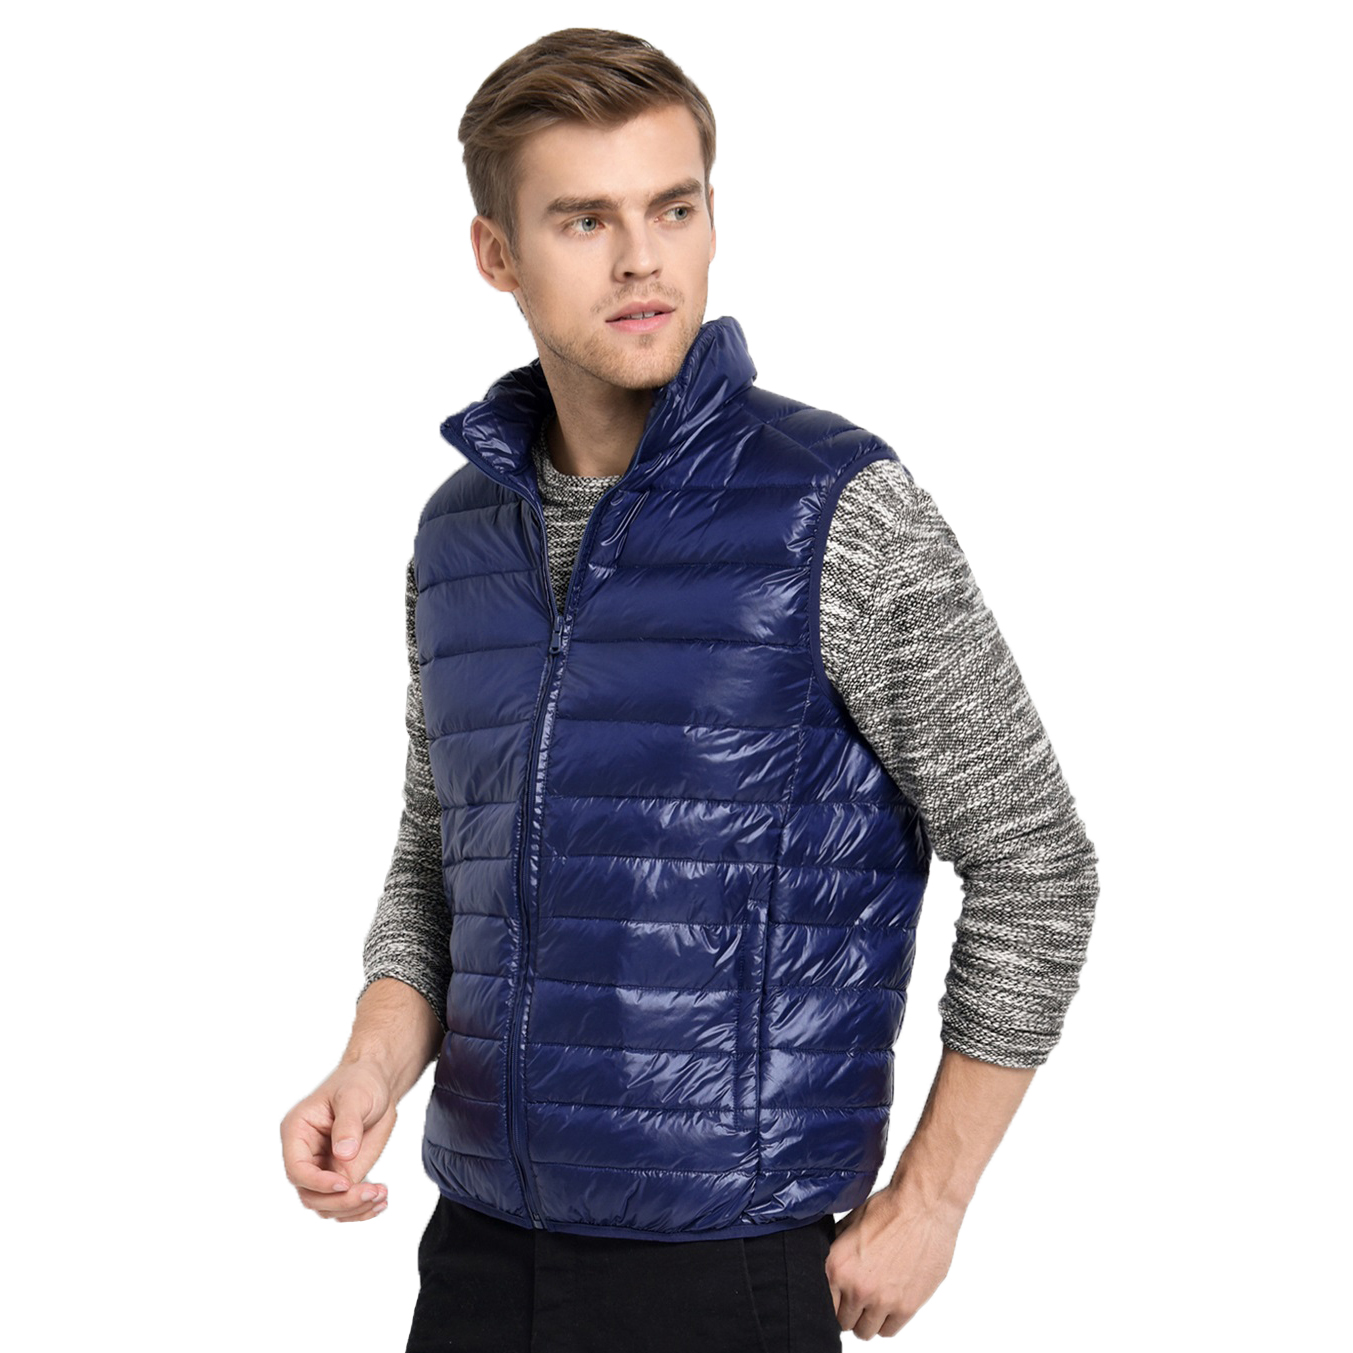 Image 4 - 2019 New Arrival Brand Men Sleeveless Jacket Winter Ultralight White Duck Down Vest Male Slim Vest Mens Windproof Warm Waistcoat-in Vests & Waistcoats from Men's Clothing